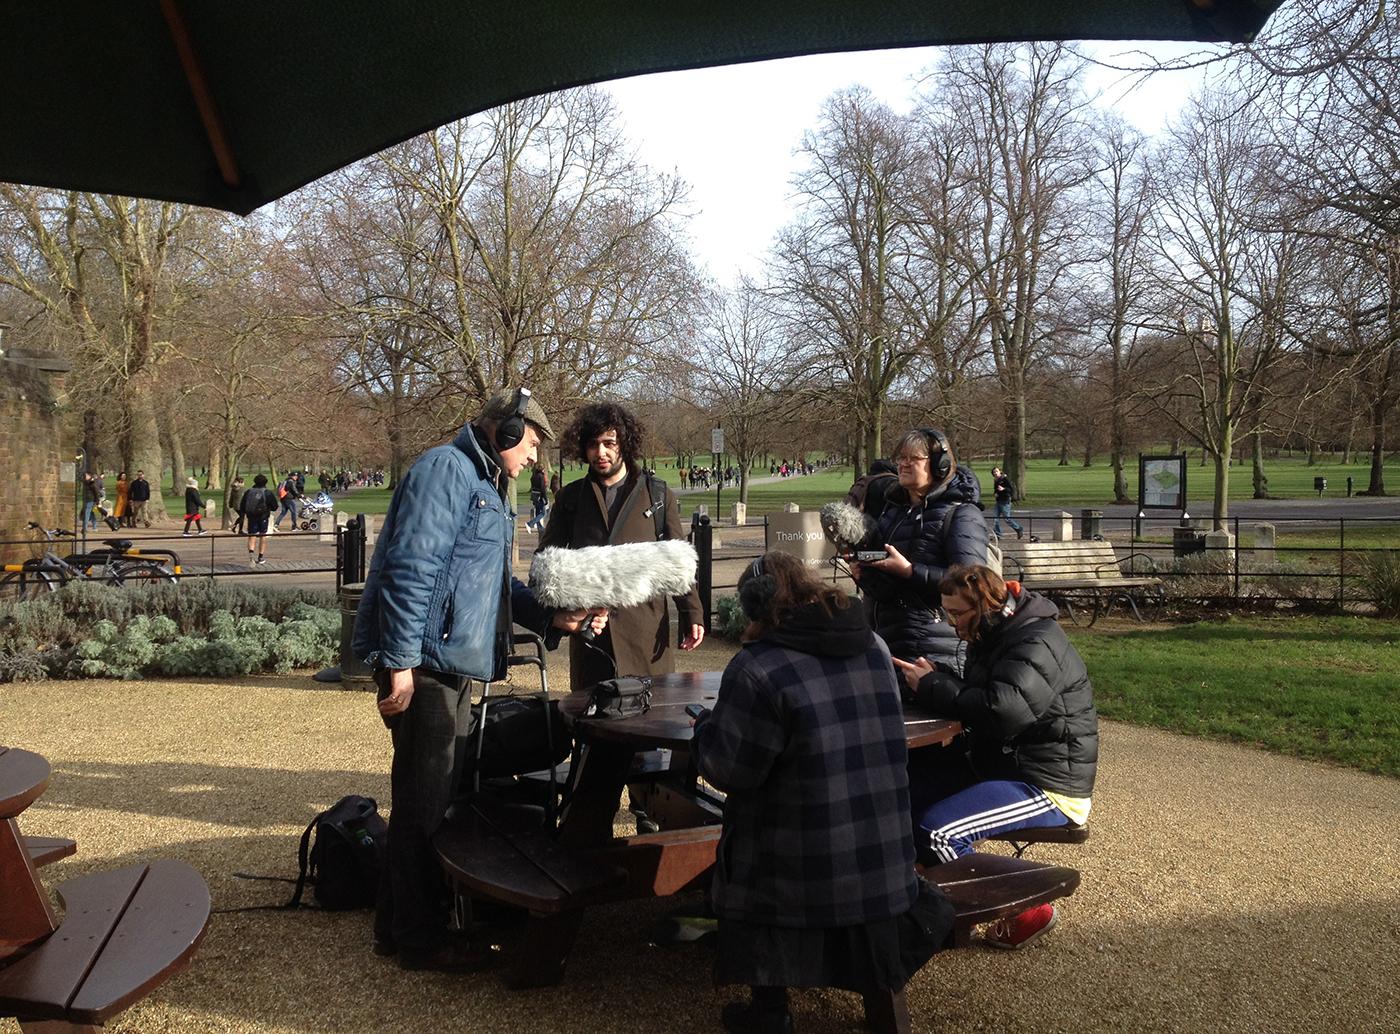 Field trip to Greenwich